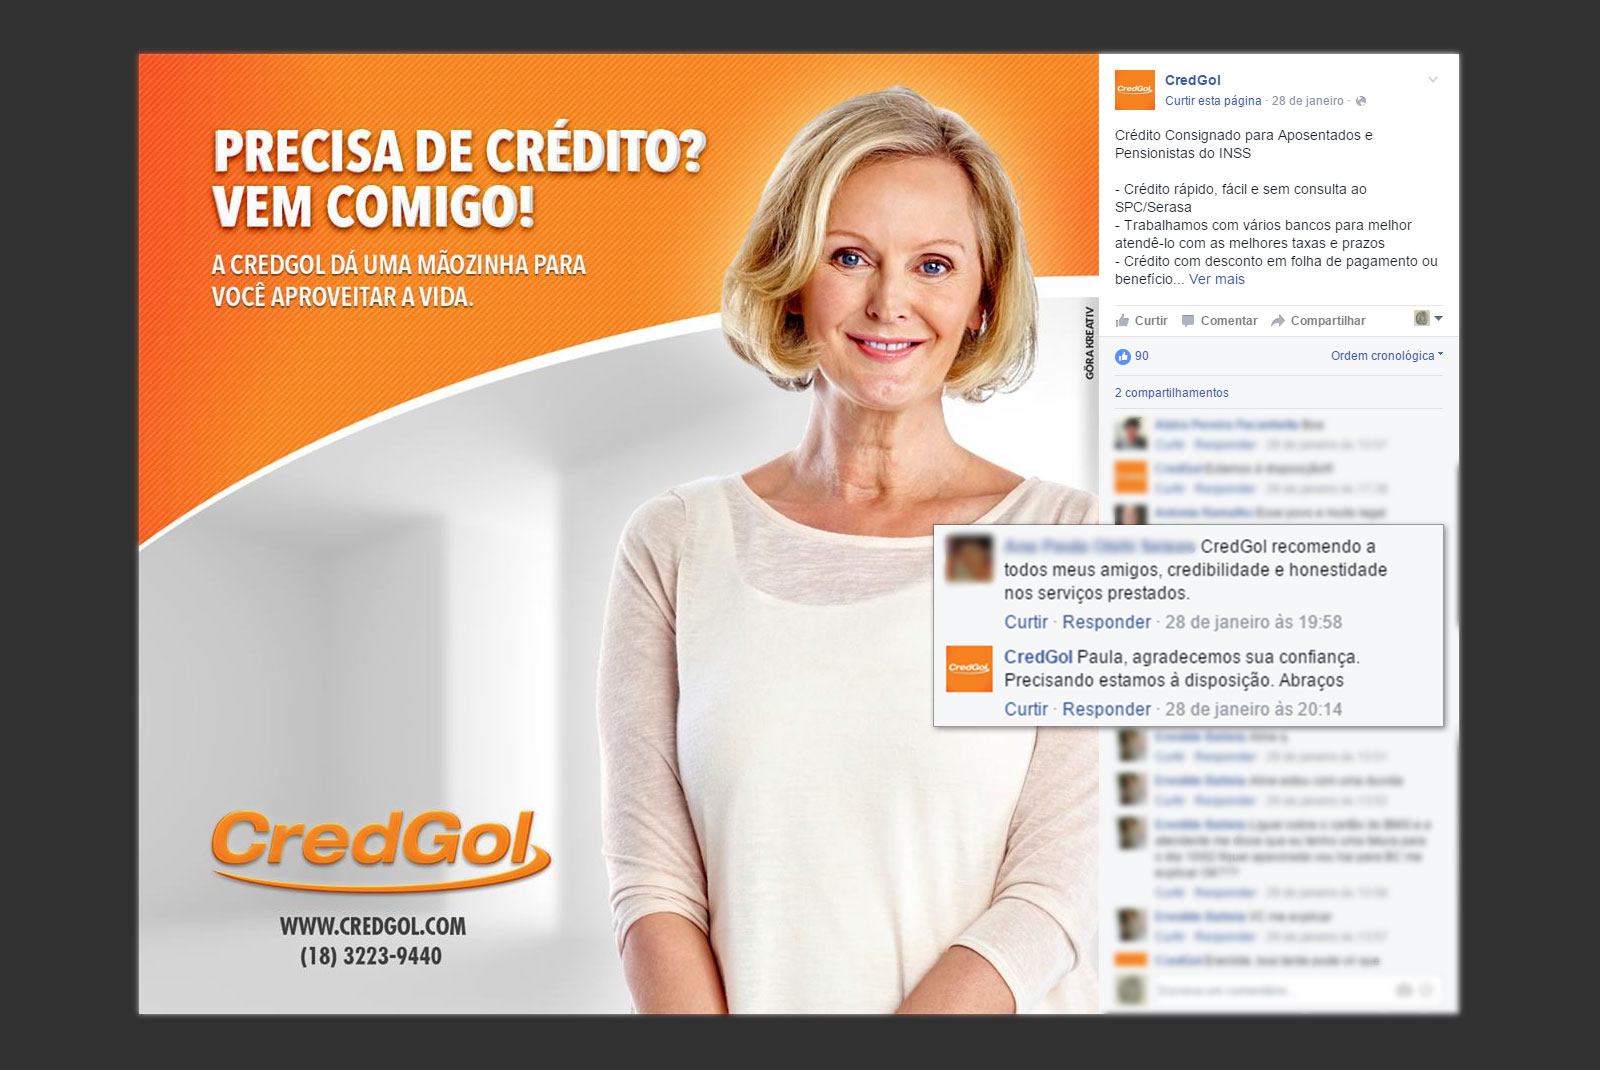 CredGol